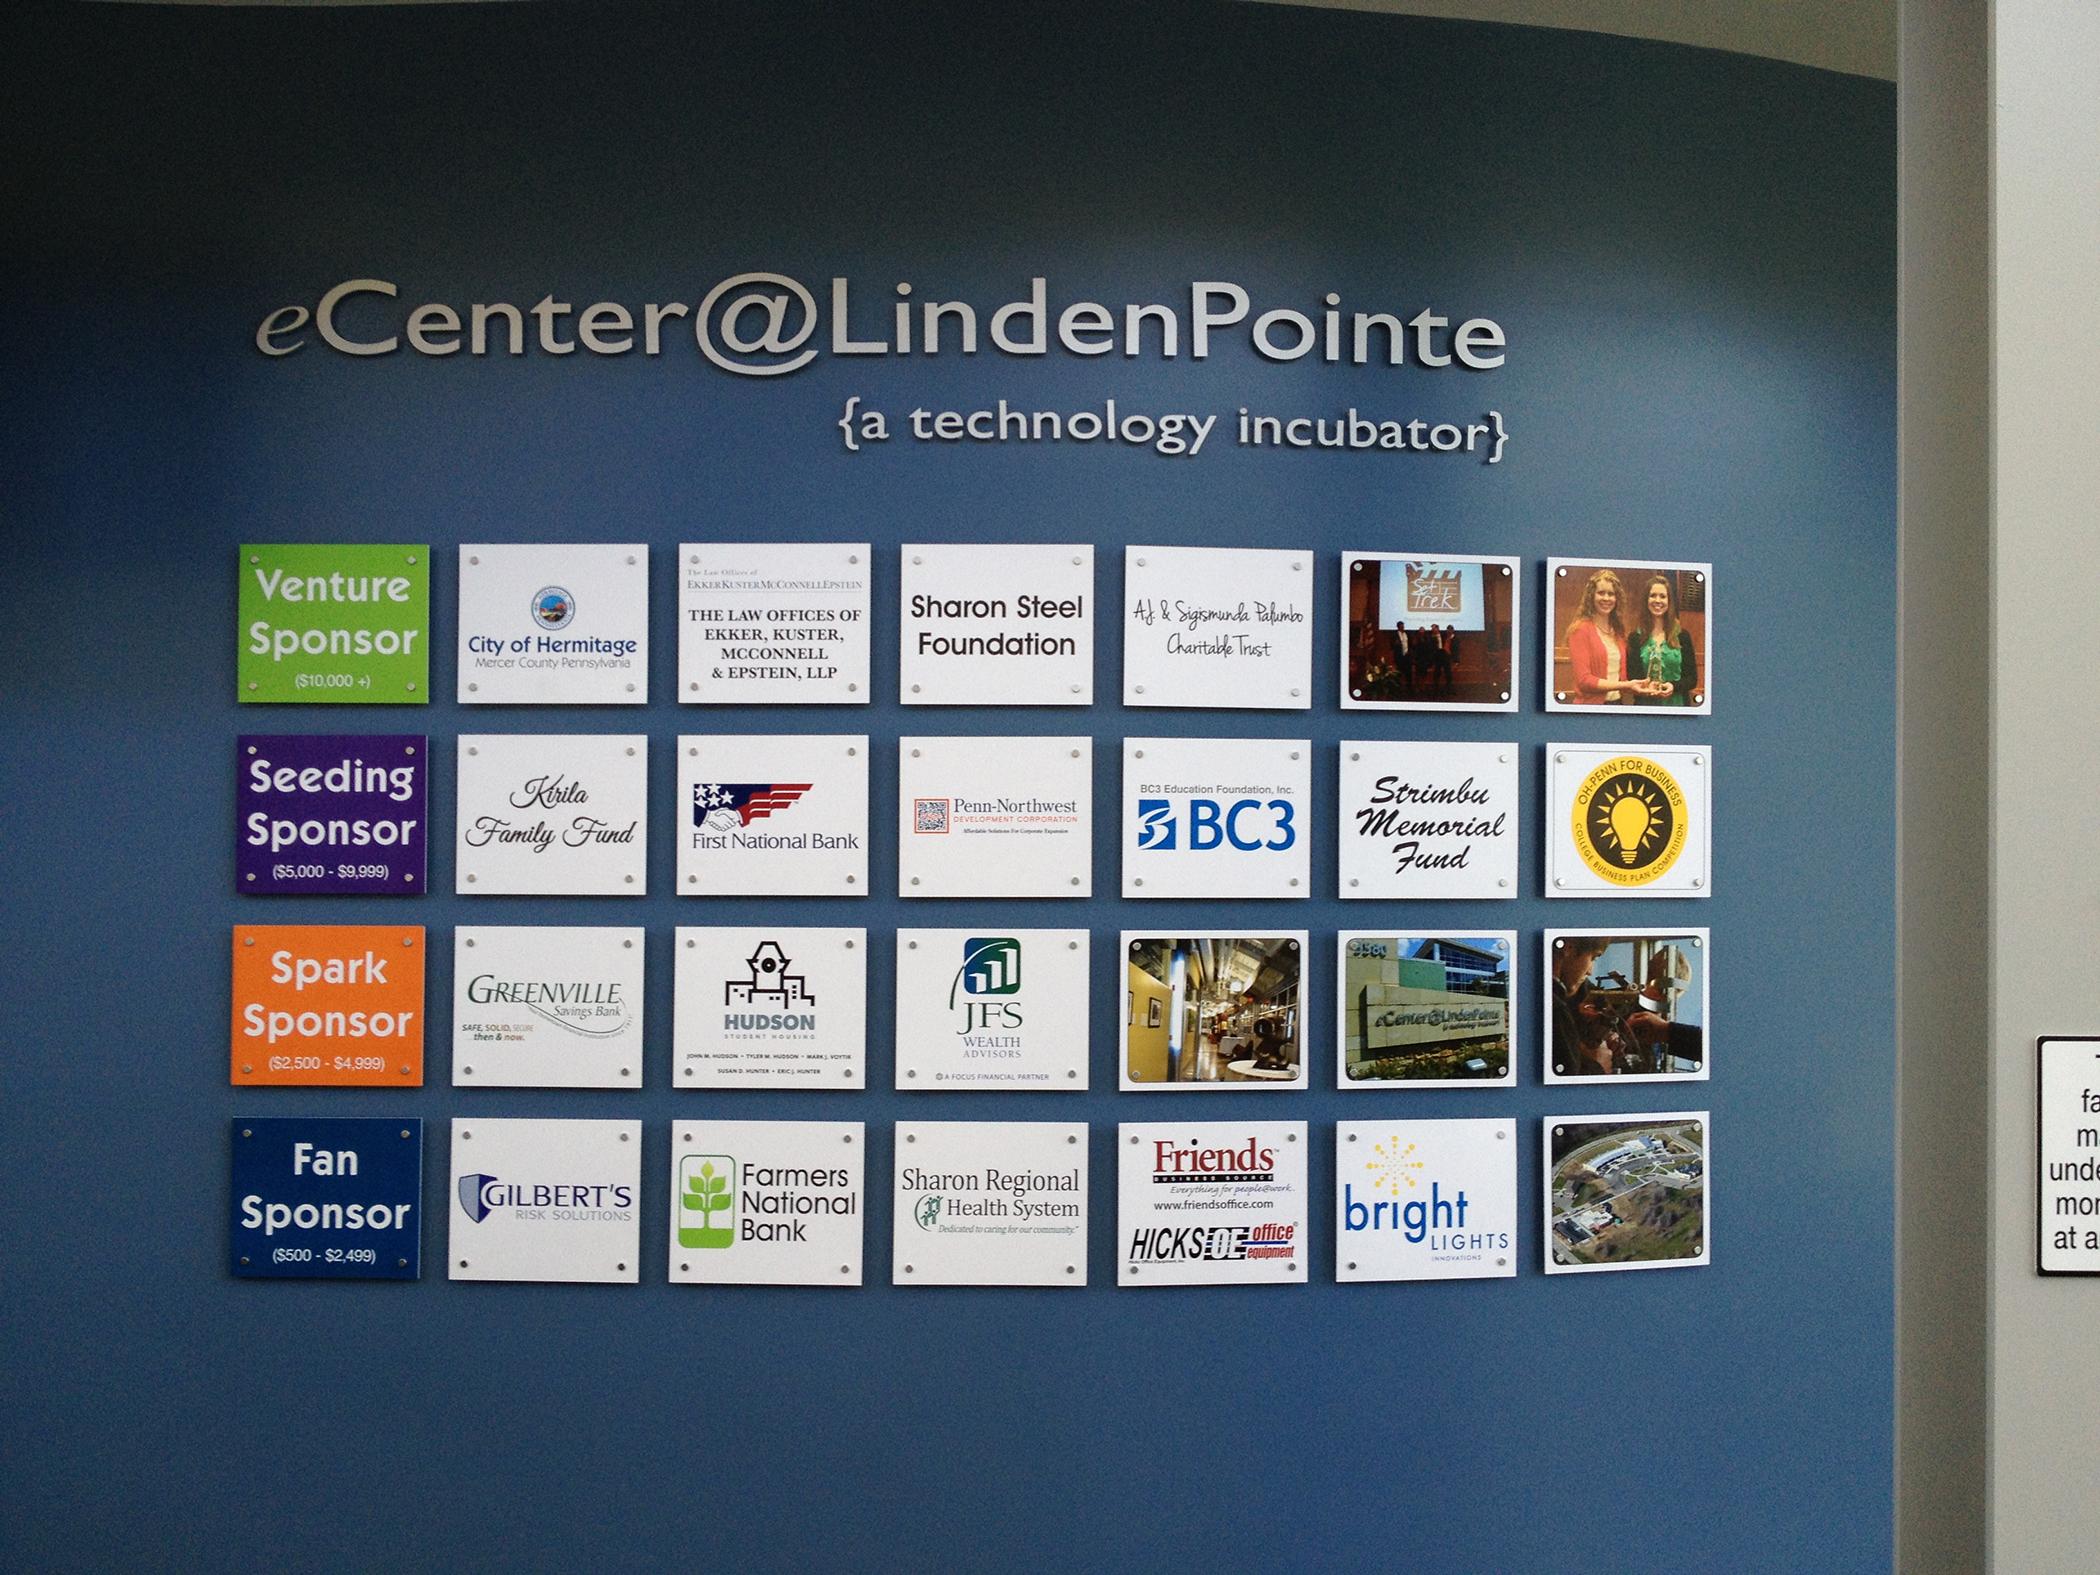 Client: eCenter@Lindenpointe